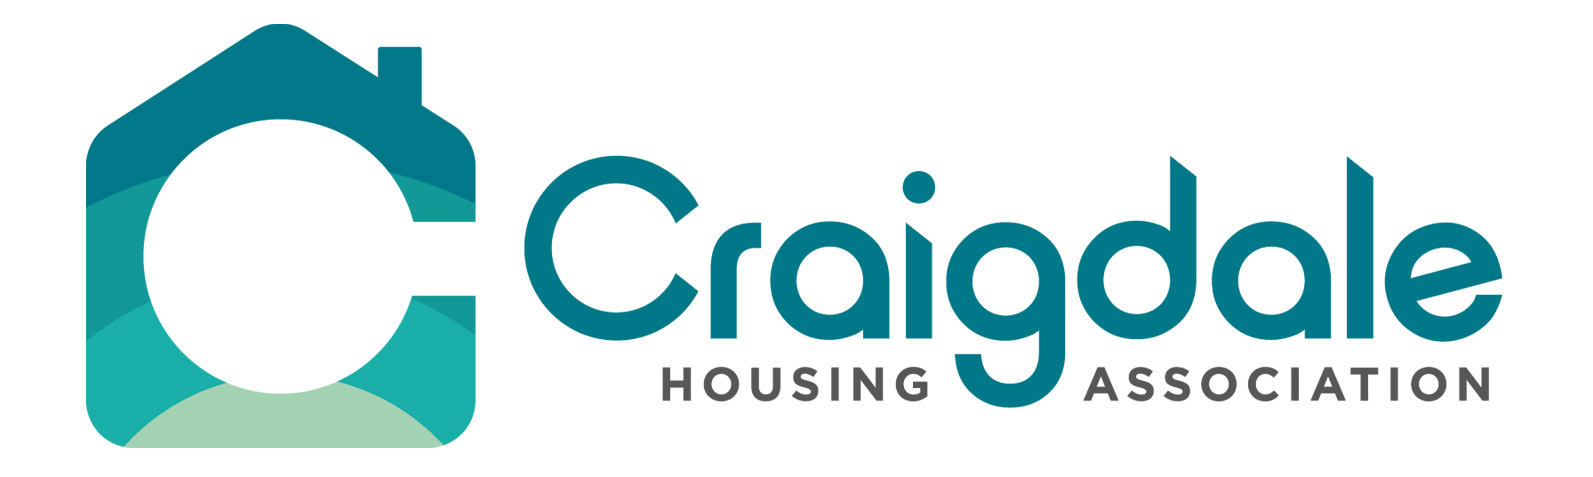 Craigdale Housing Association